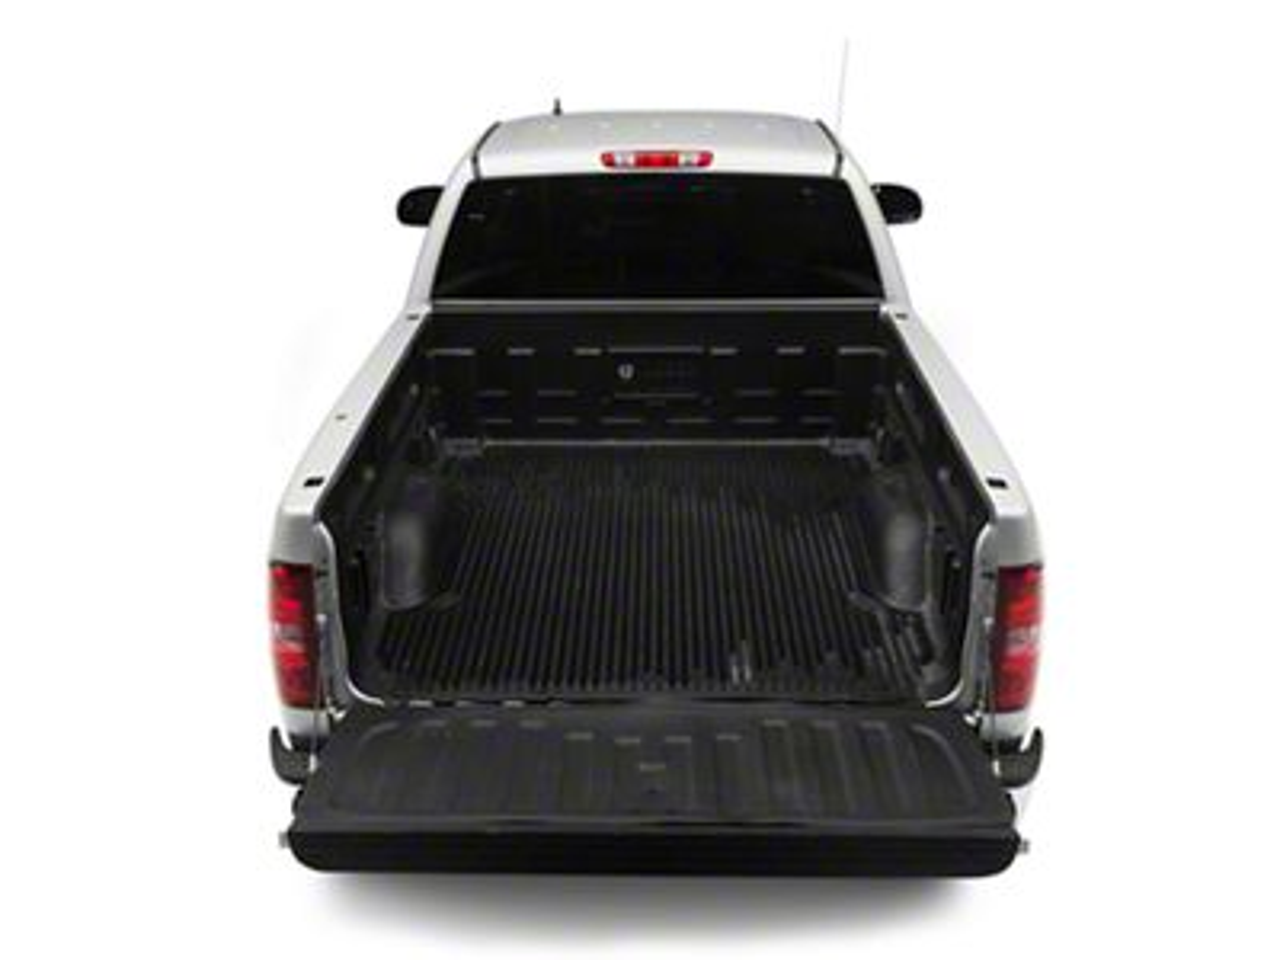 Weathertech TechLiner Tailgate Liner - Black (07-13 Silverado 1500)